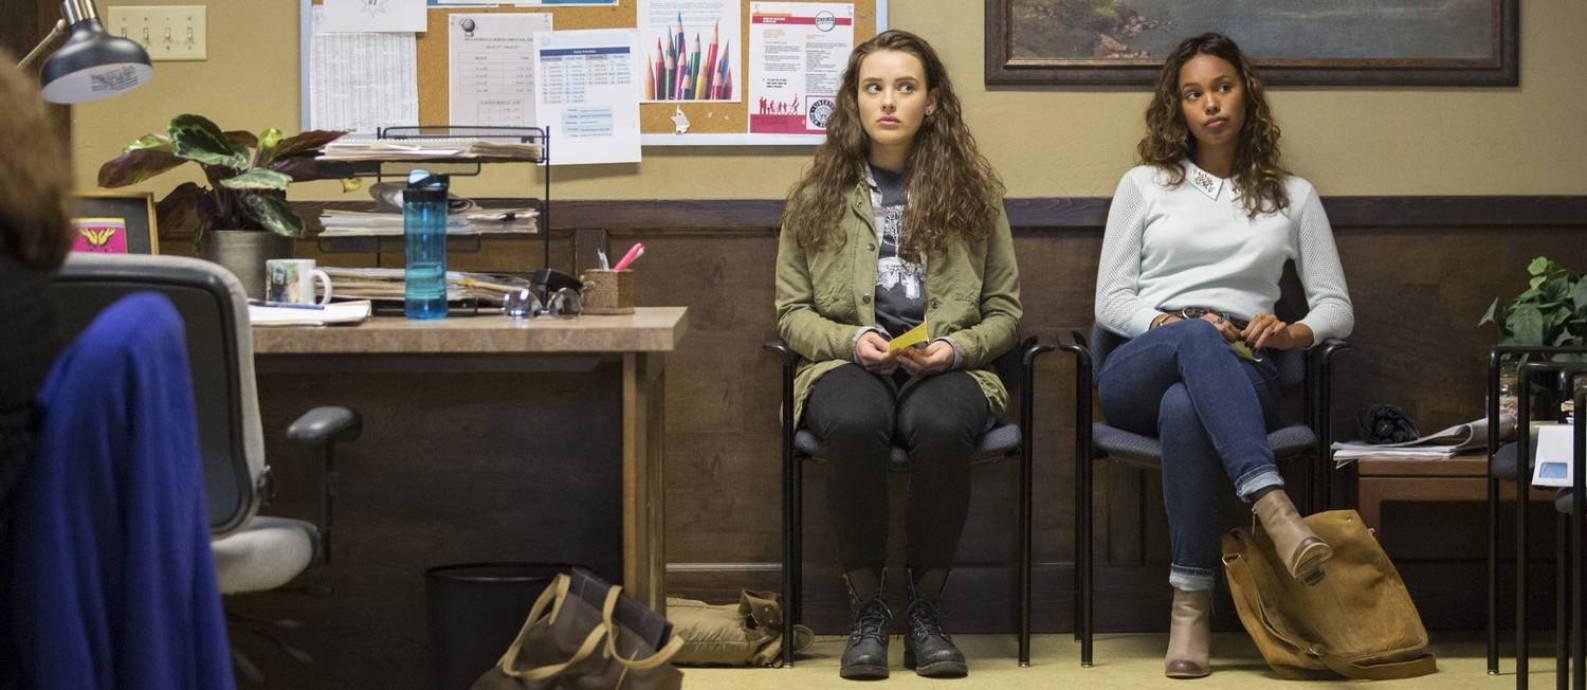 Cena da série '13 reasons why' Foto: Beth Dubber/Netflix